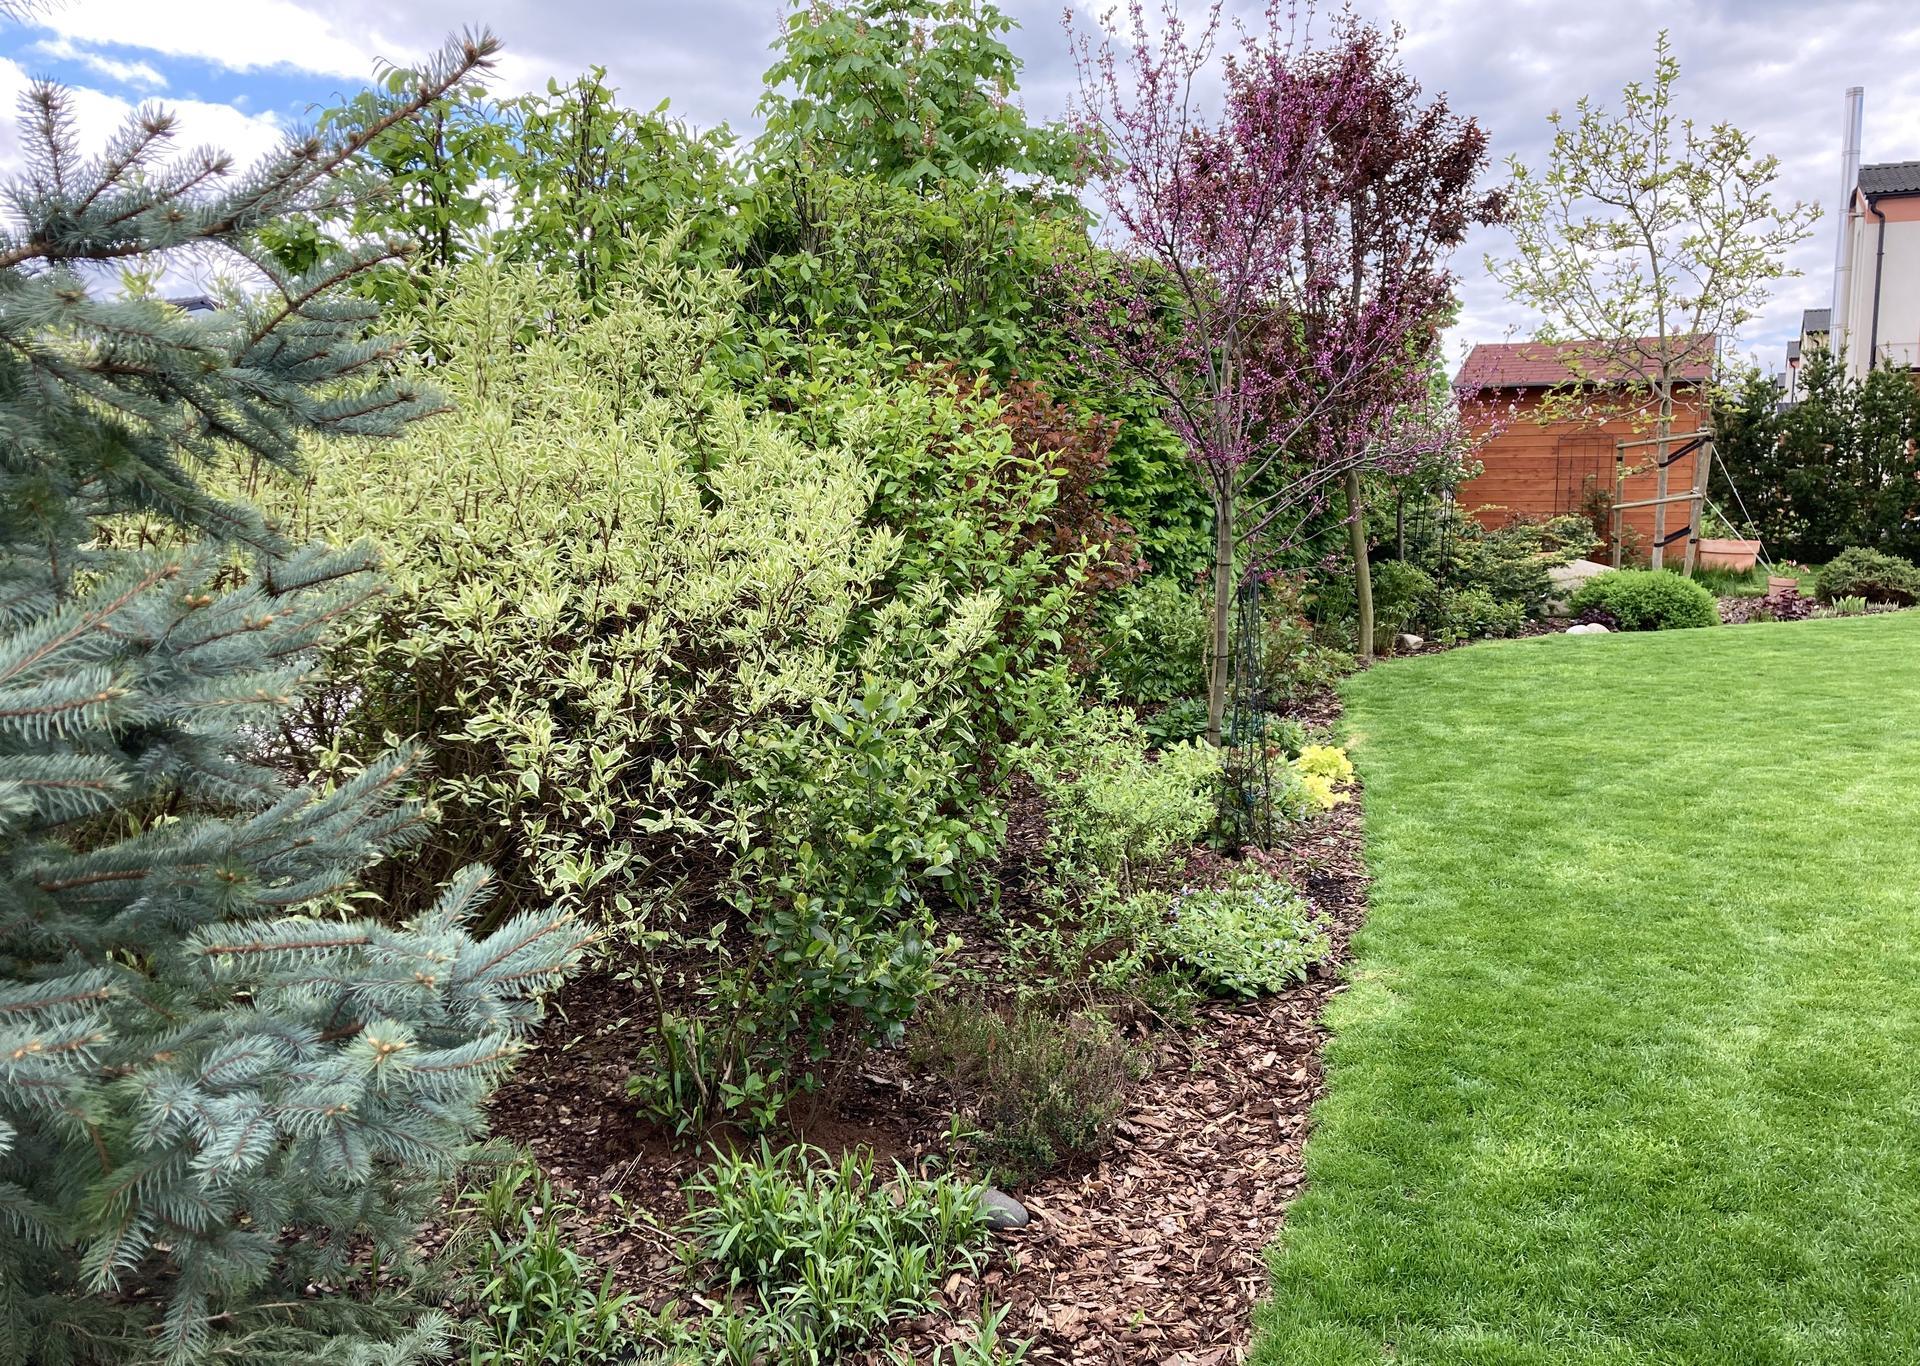 Zahrada 2021 - Obrázek č. 38